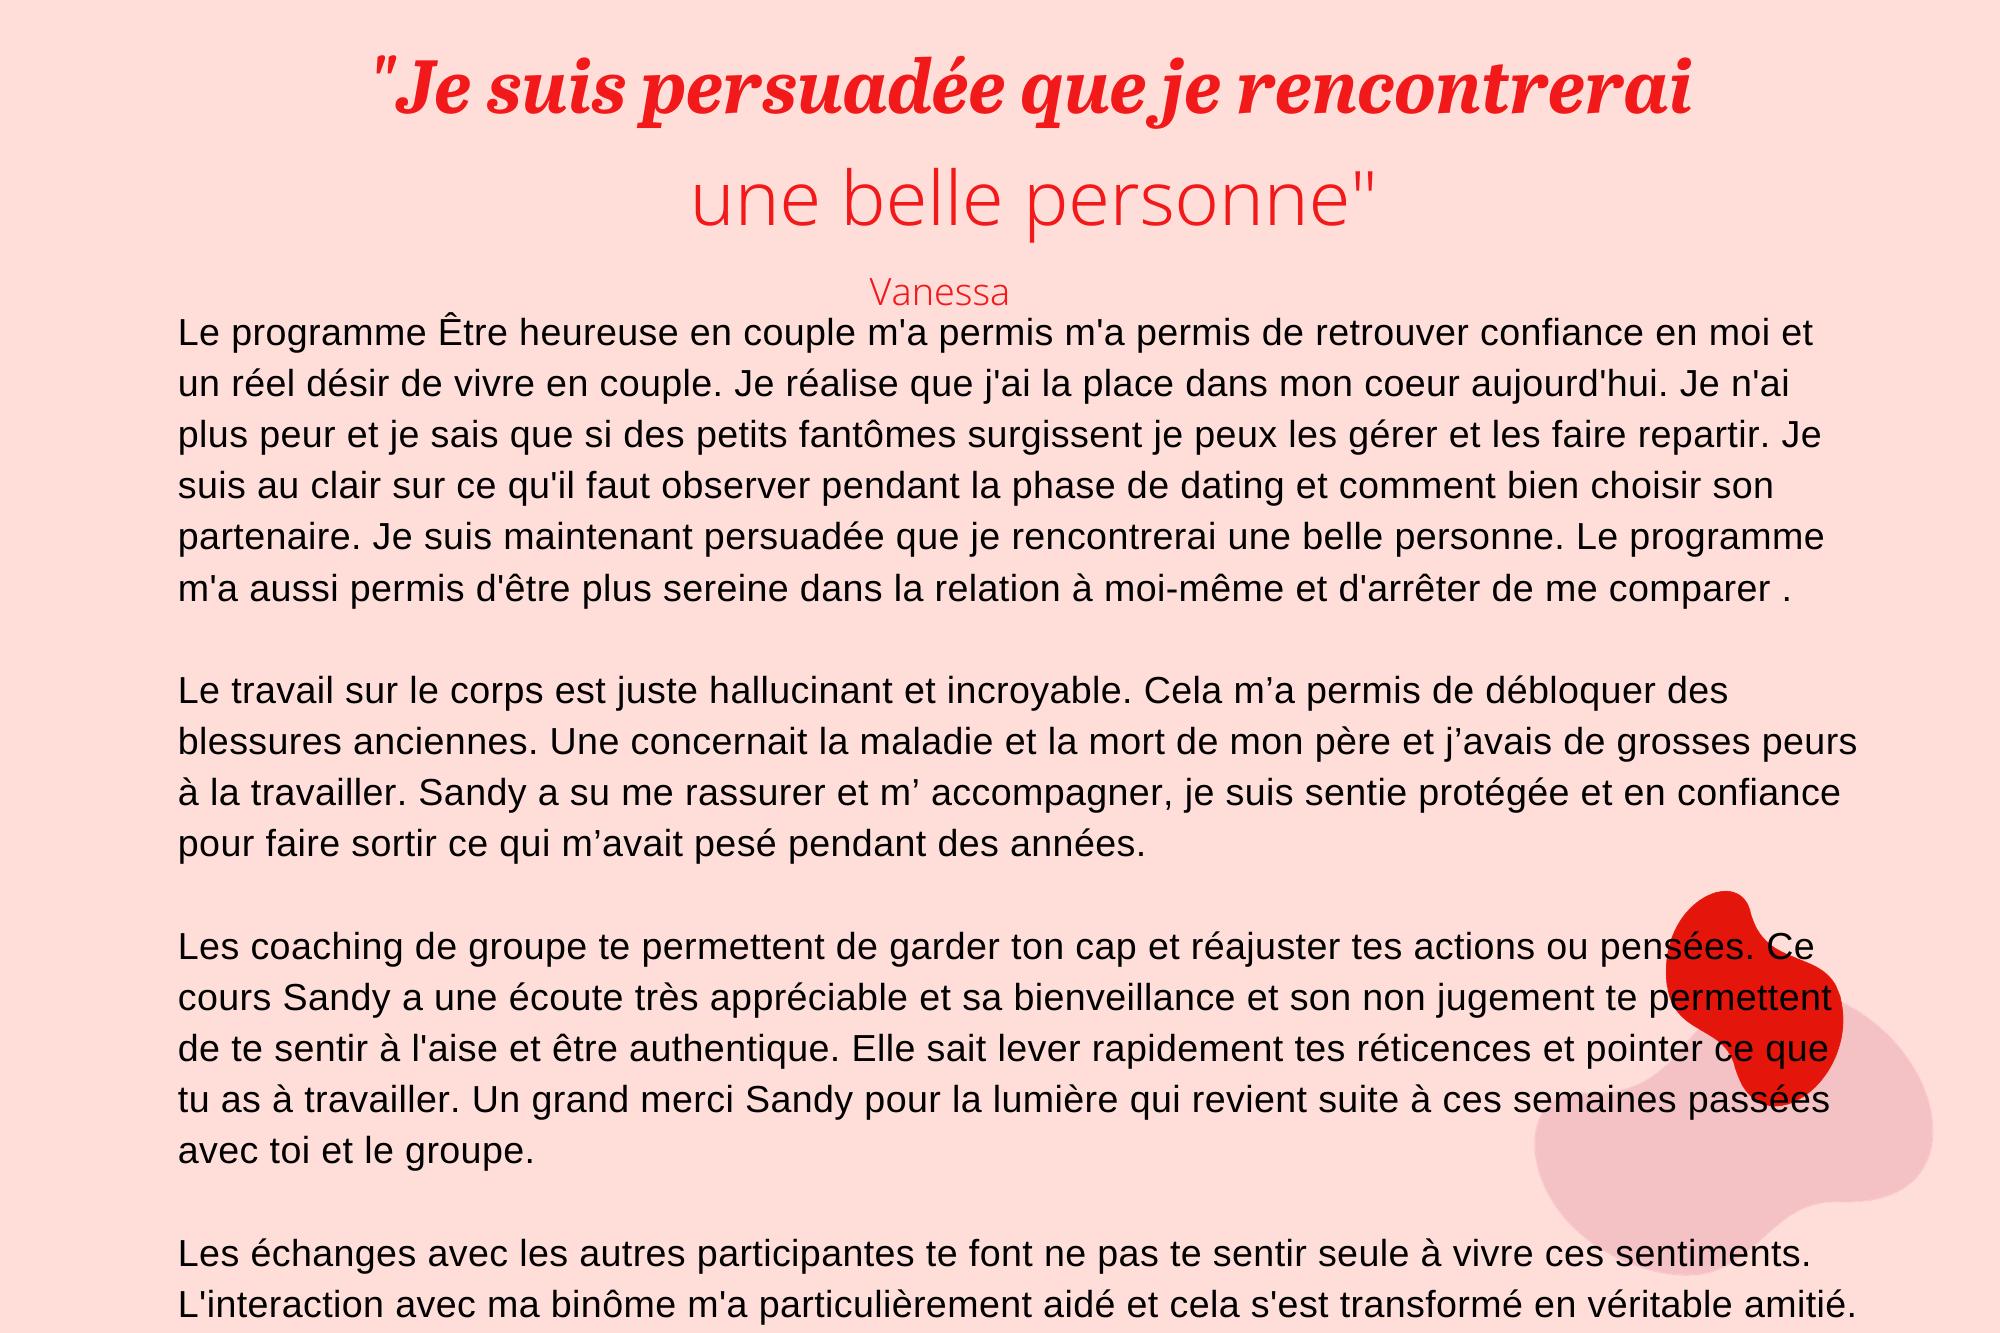 FR_Temoignage_coachamour_jesuispersuadeequejerencontreraiunebellepersonne